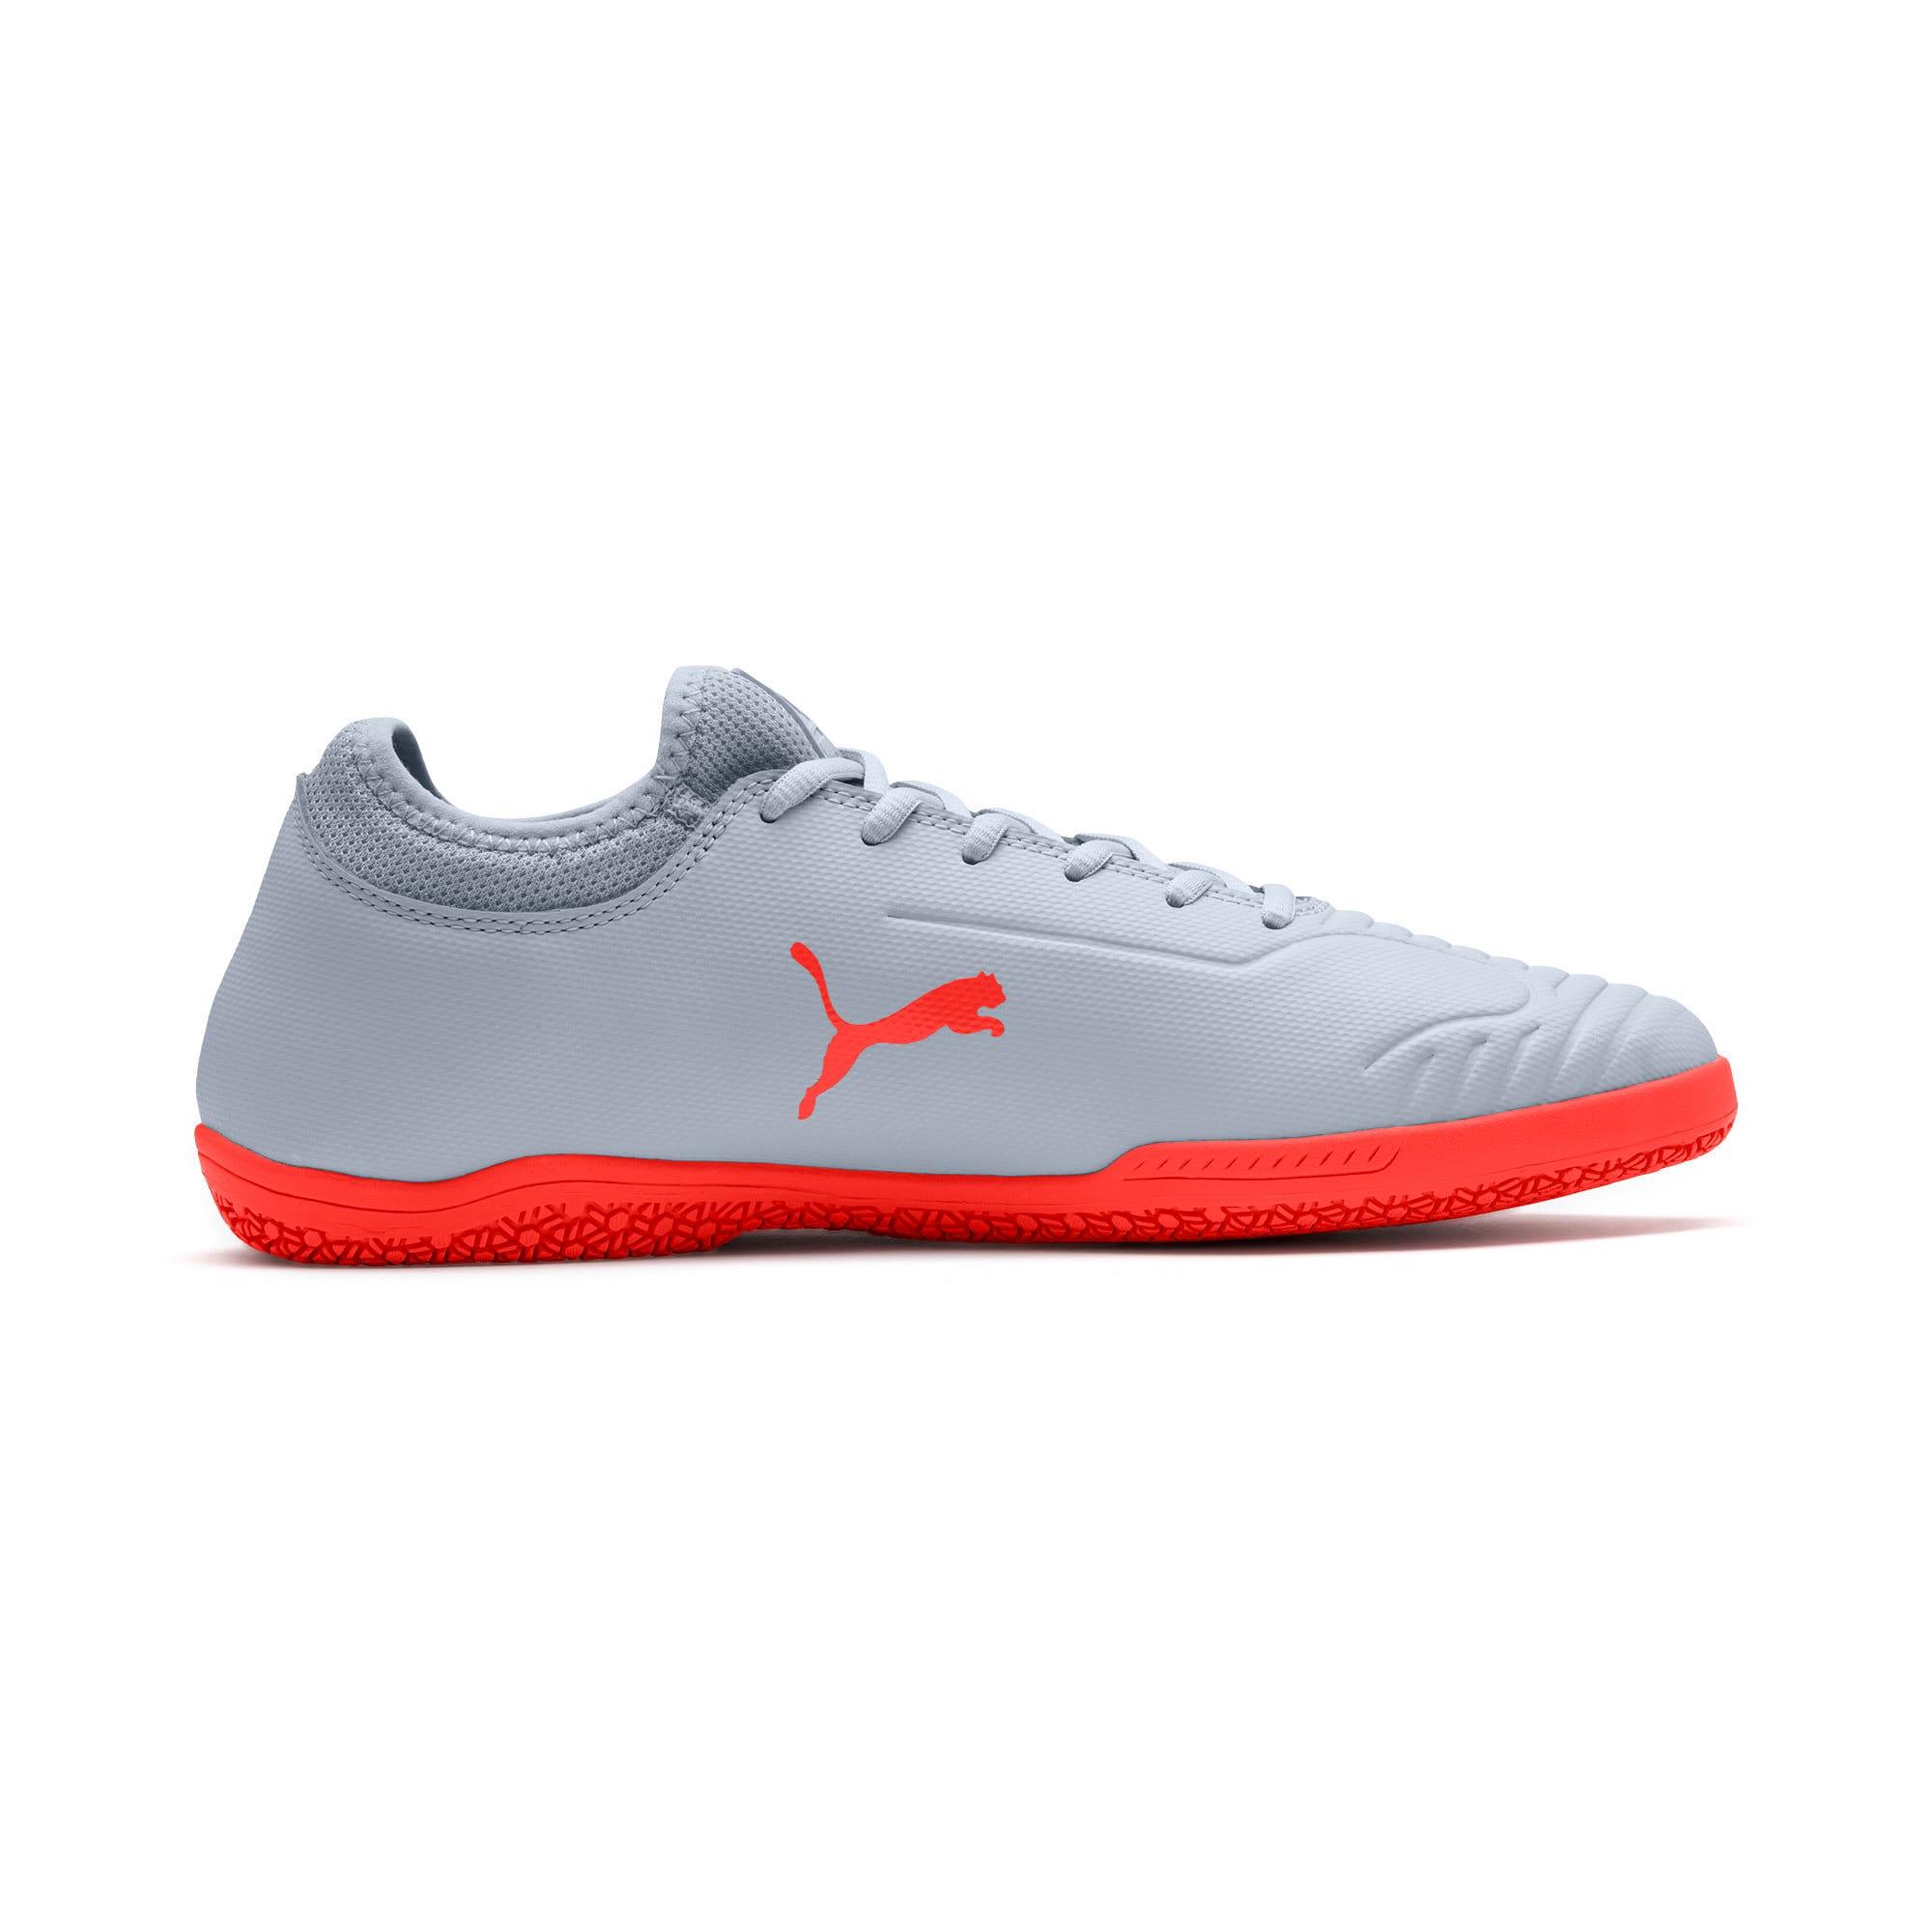 Thumbnail 6 of 365 Sala 2 Men's Soccer Shoes, Grey Dawn-Nrgy Red, medium